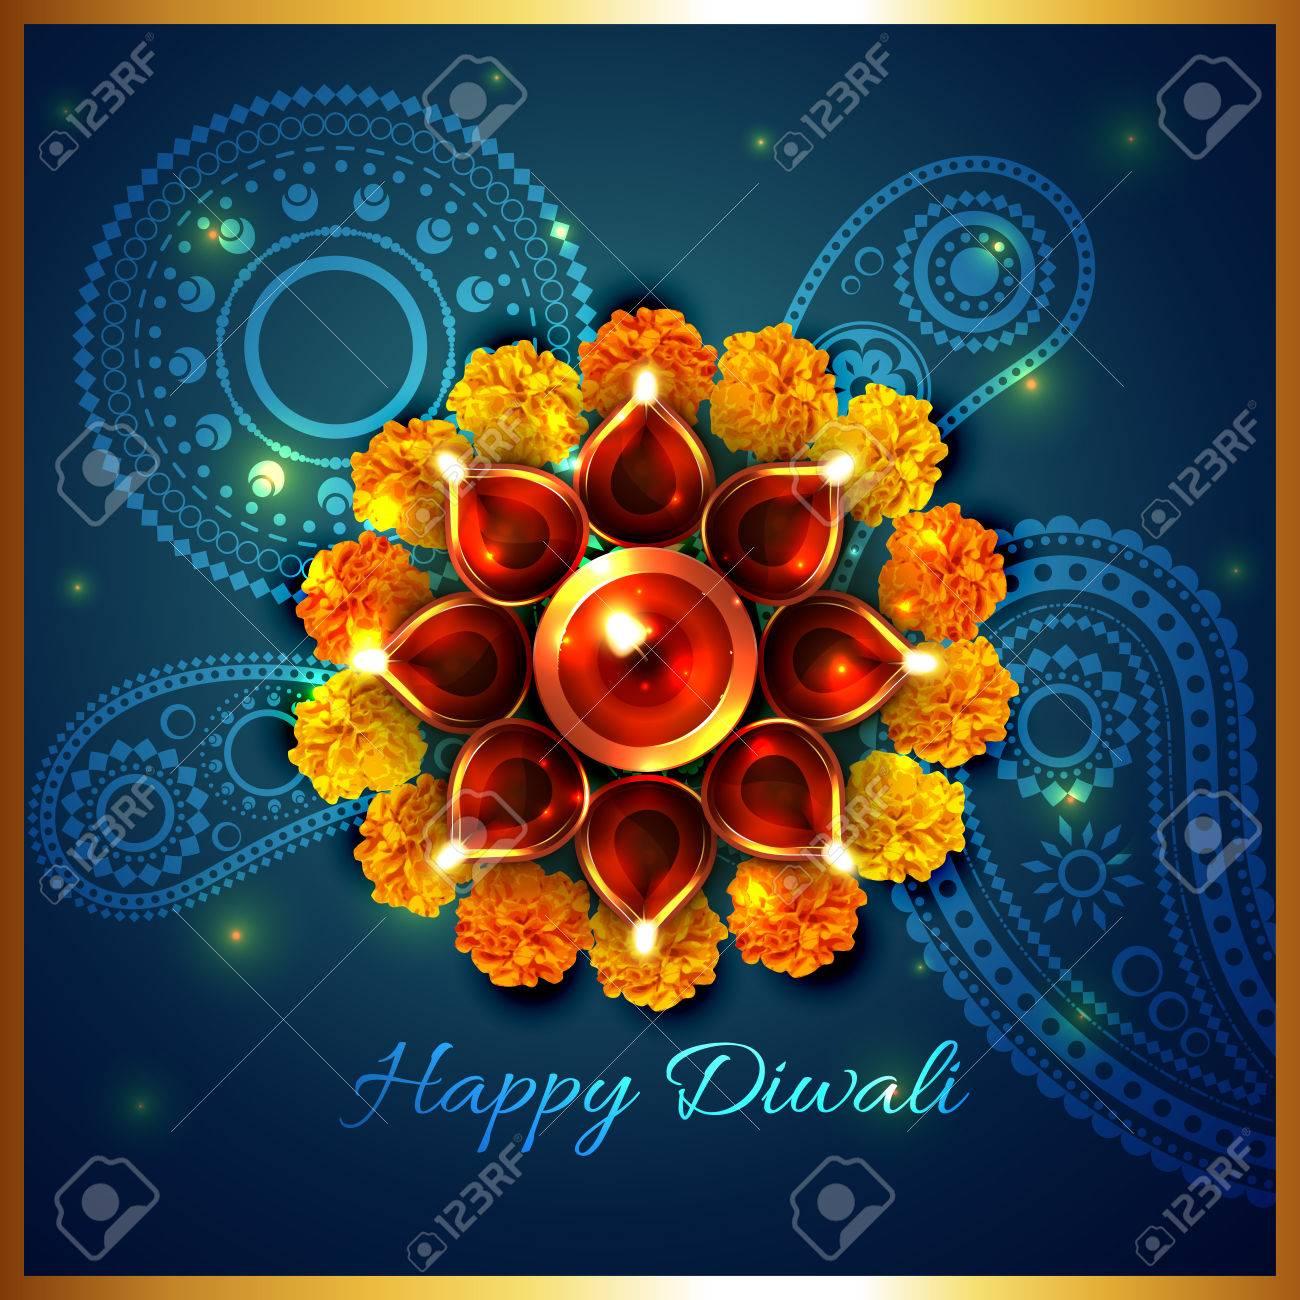 Vector artistic background of diwali royalty free cliparts vectors vector vector artistic background of diwali m4hsunfo